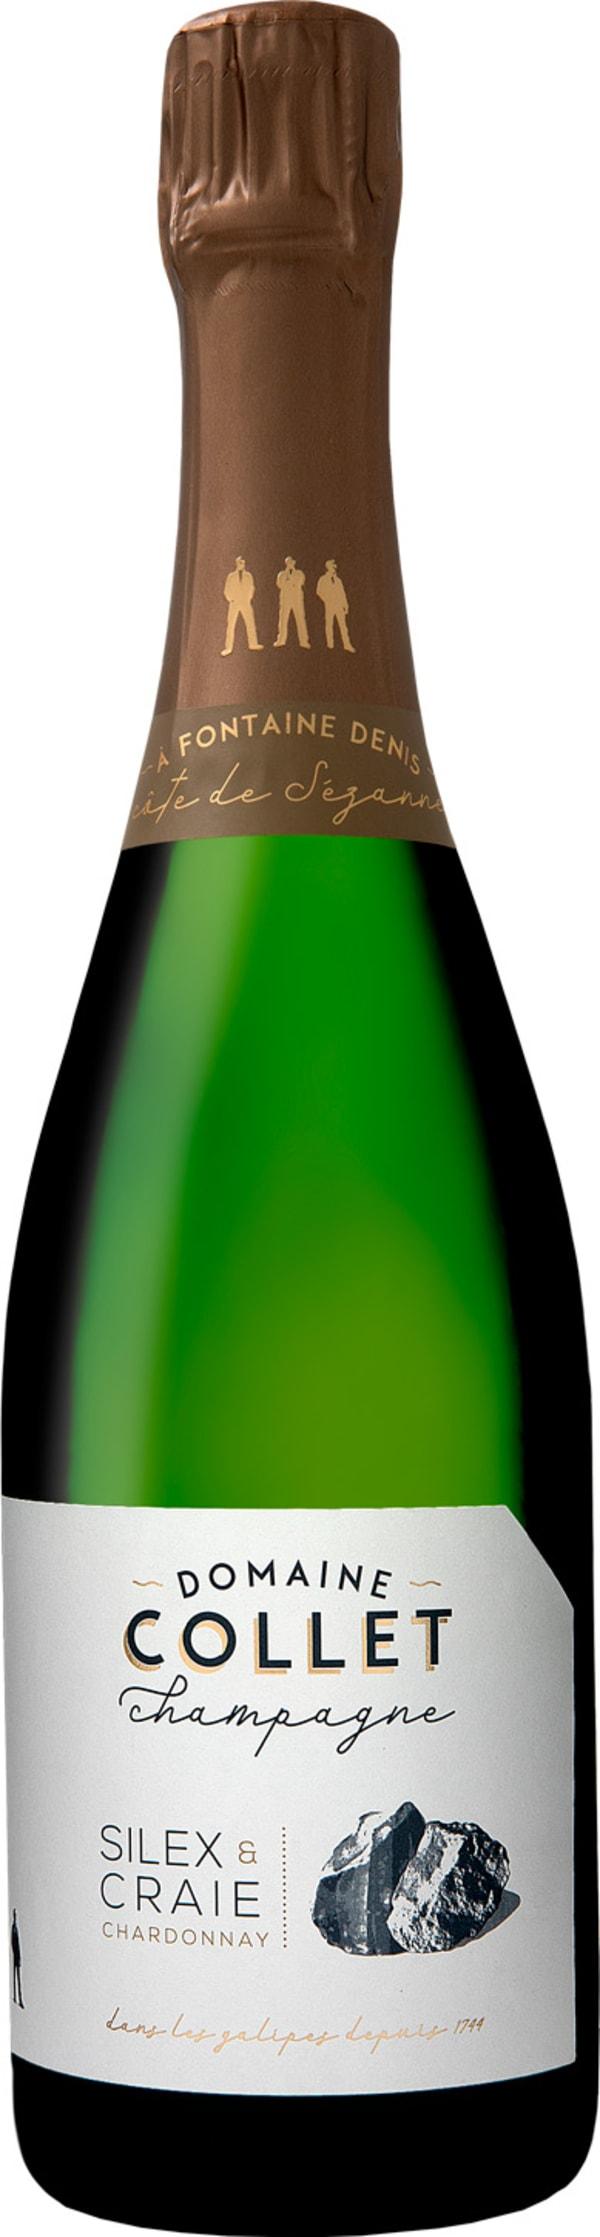 Rene Collet Empreinte de Terroir Chardonnay Champagne Extra Brut